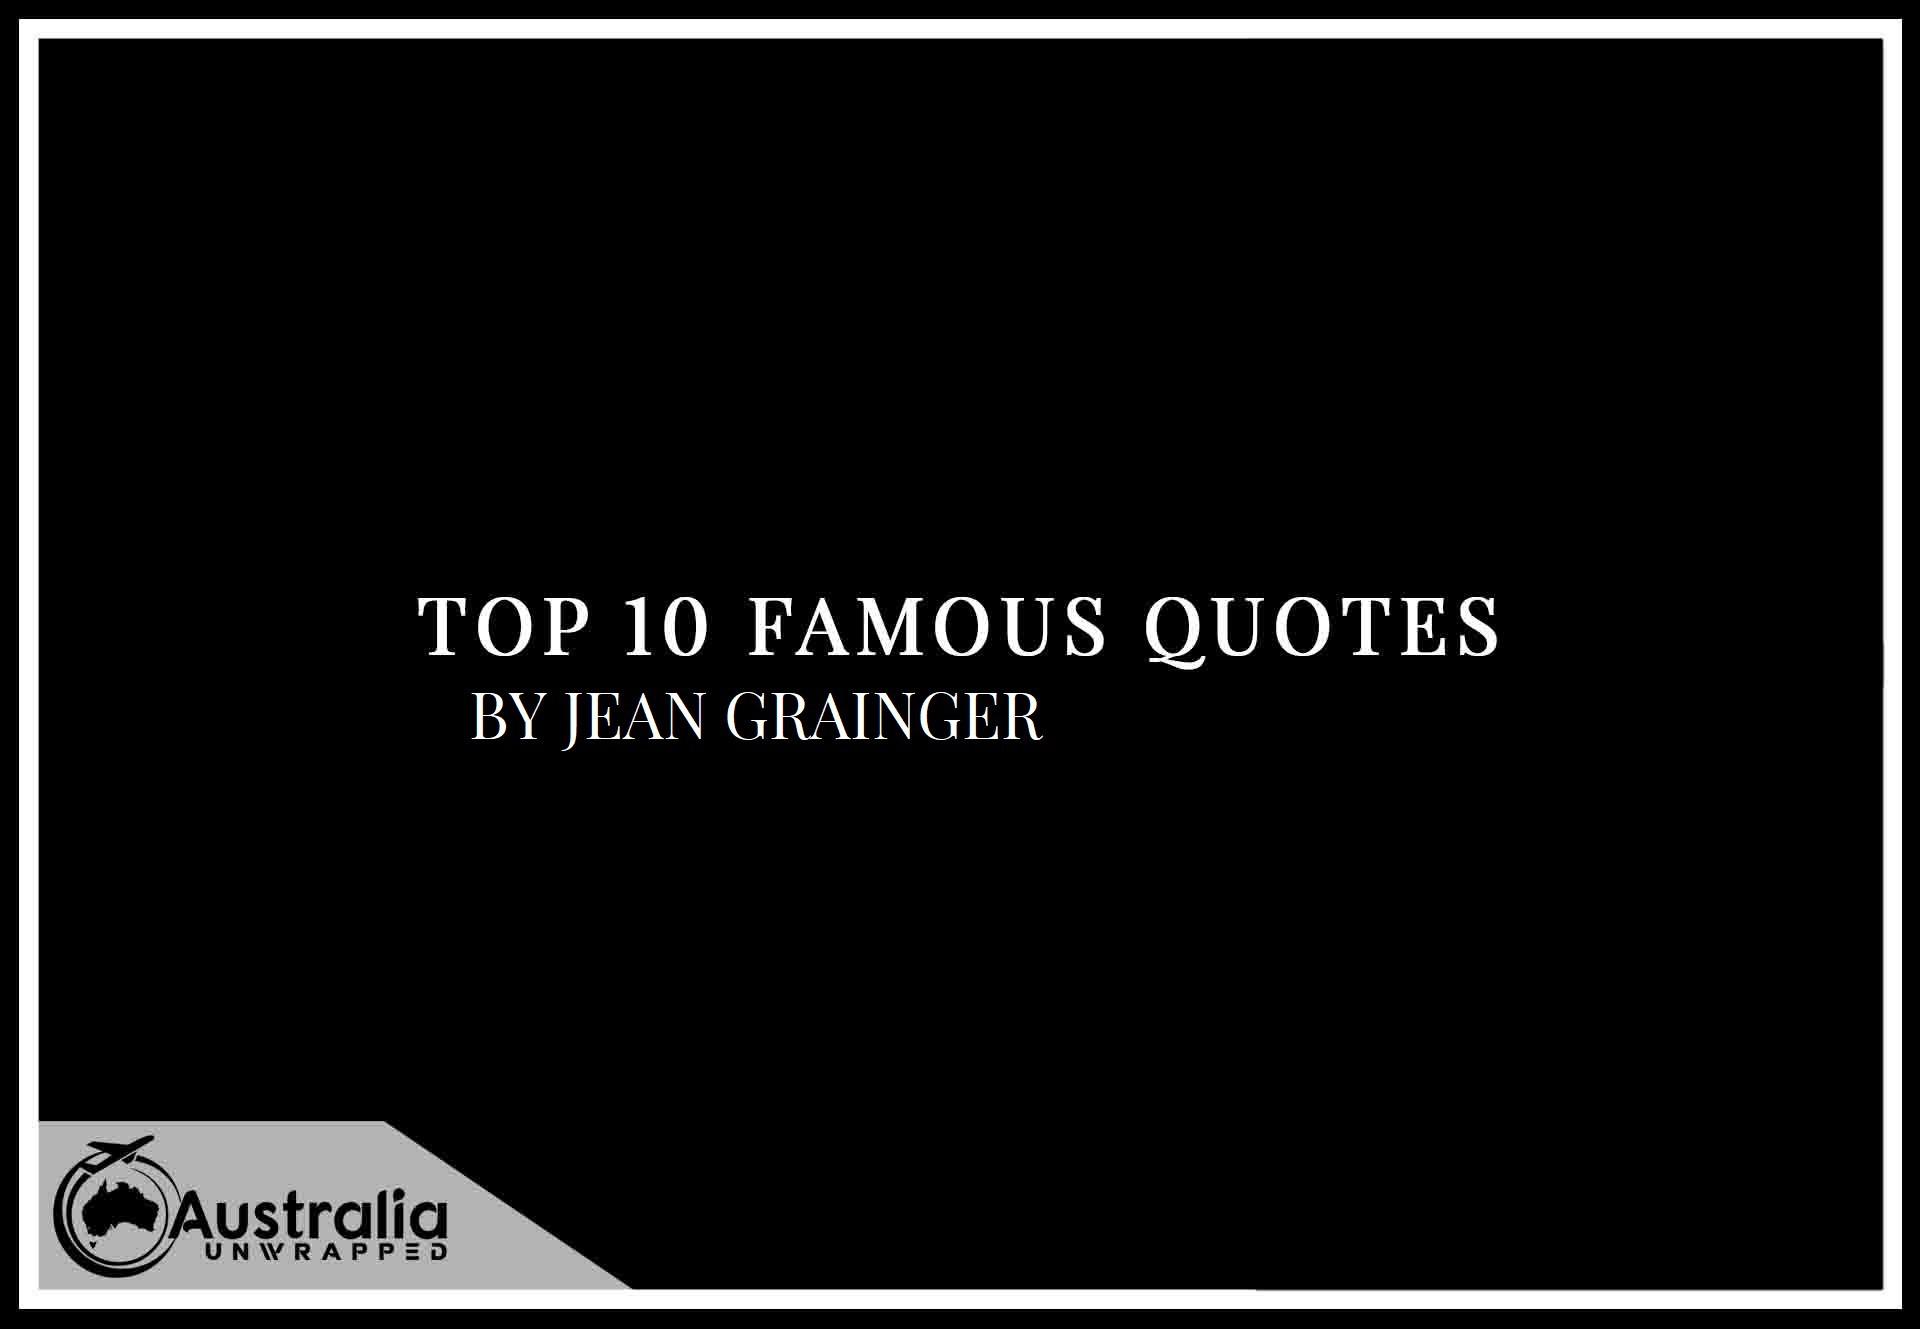 Top 10 Famous Quotes by Author Jean Grainger